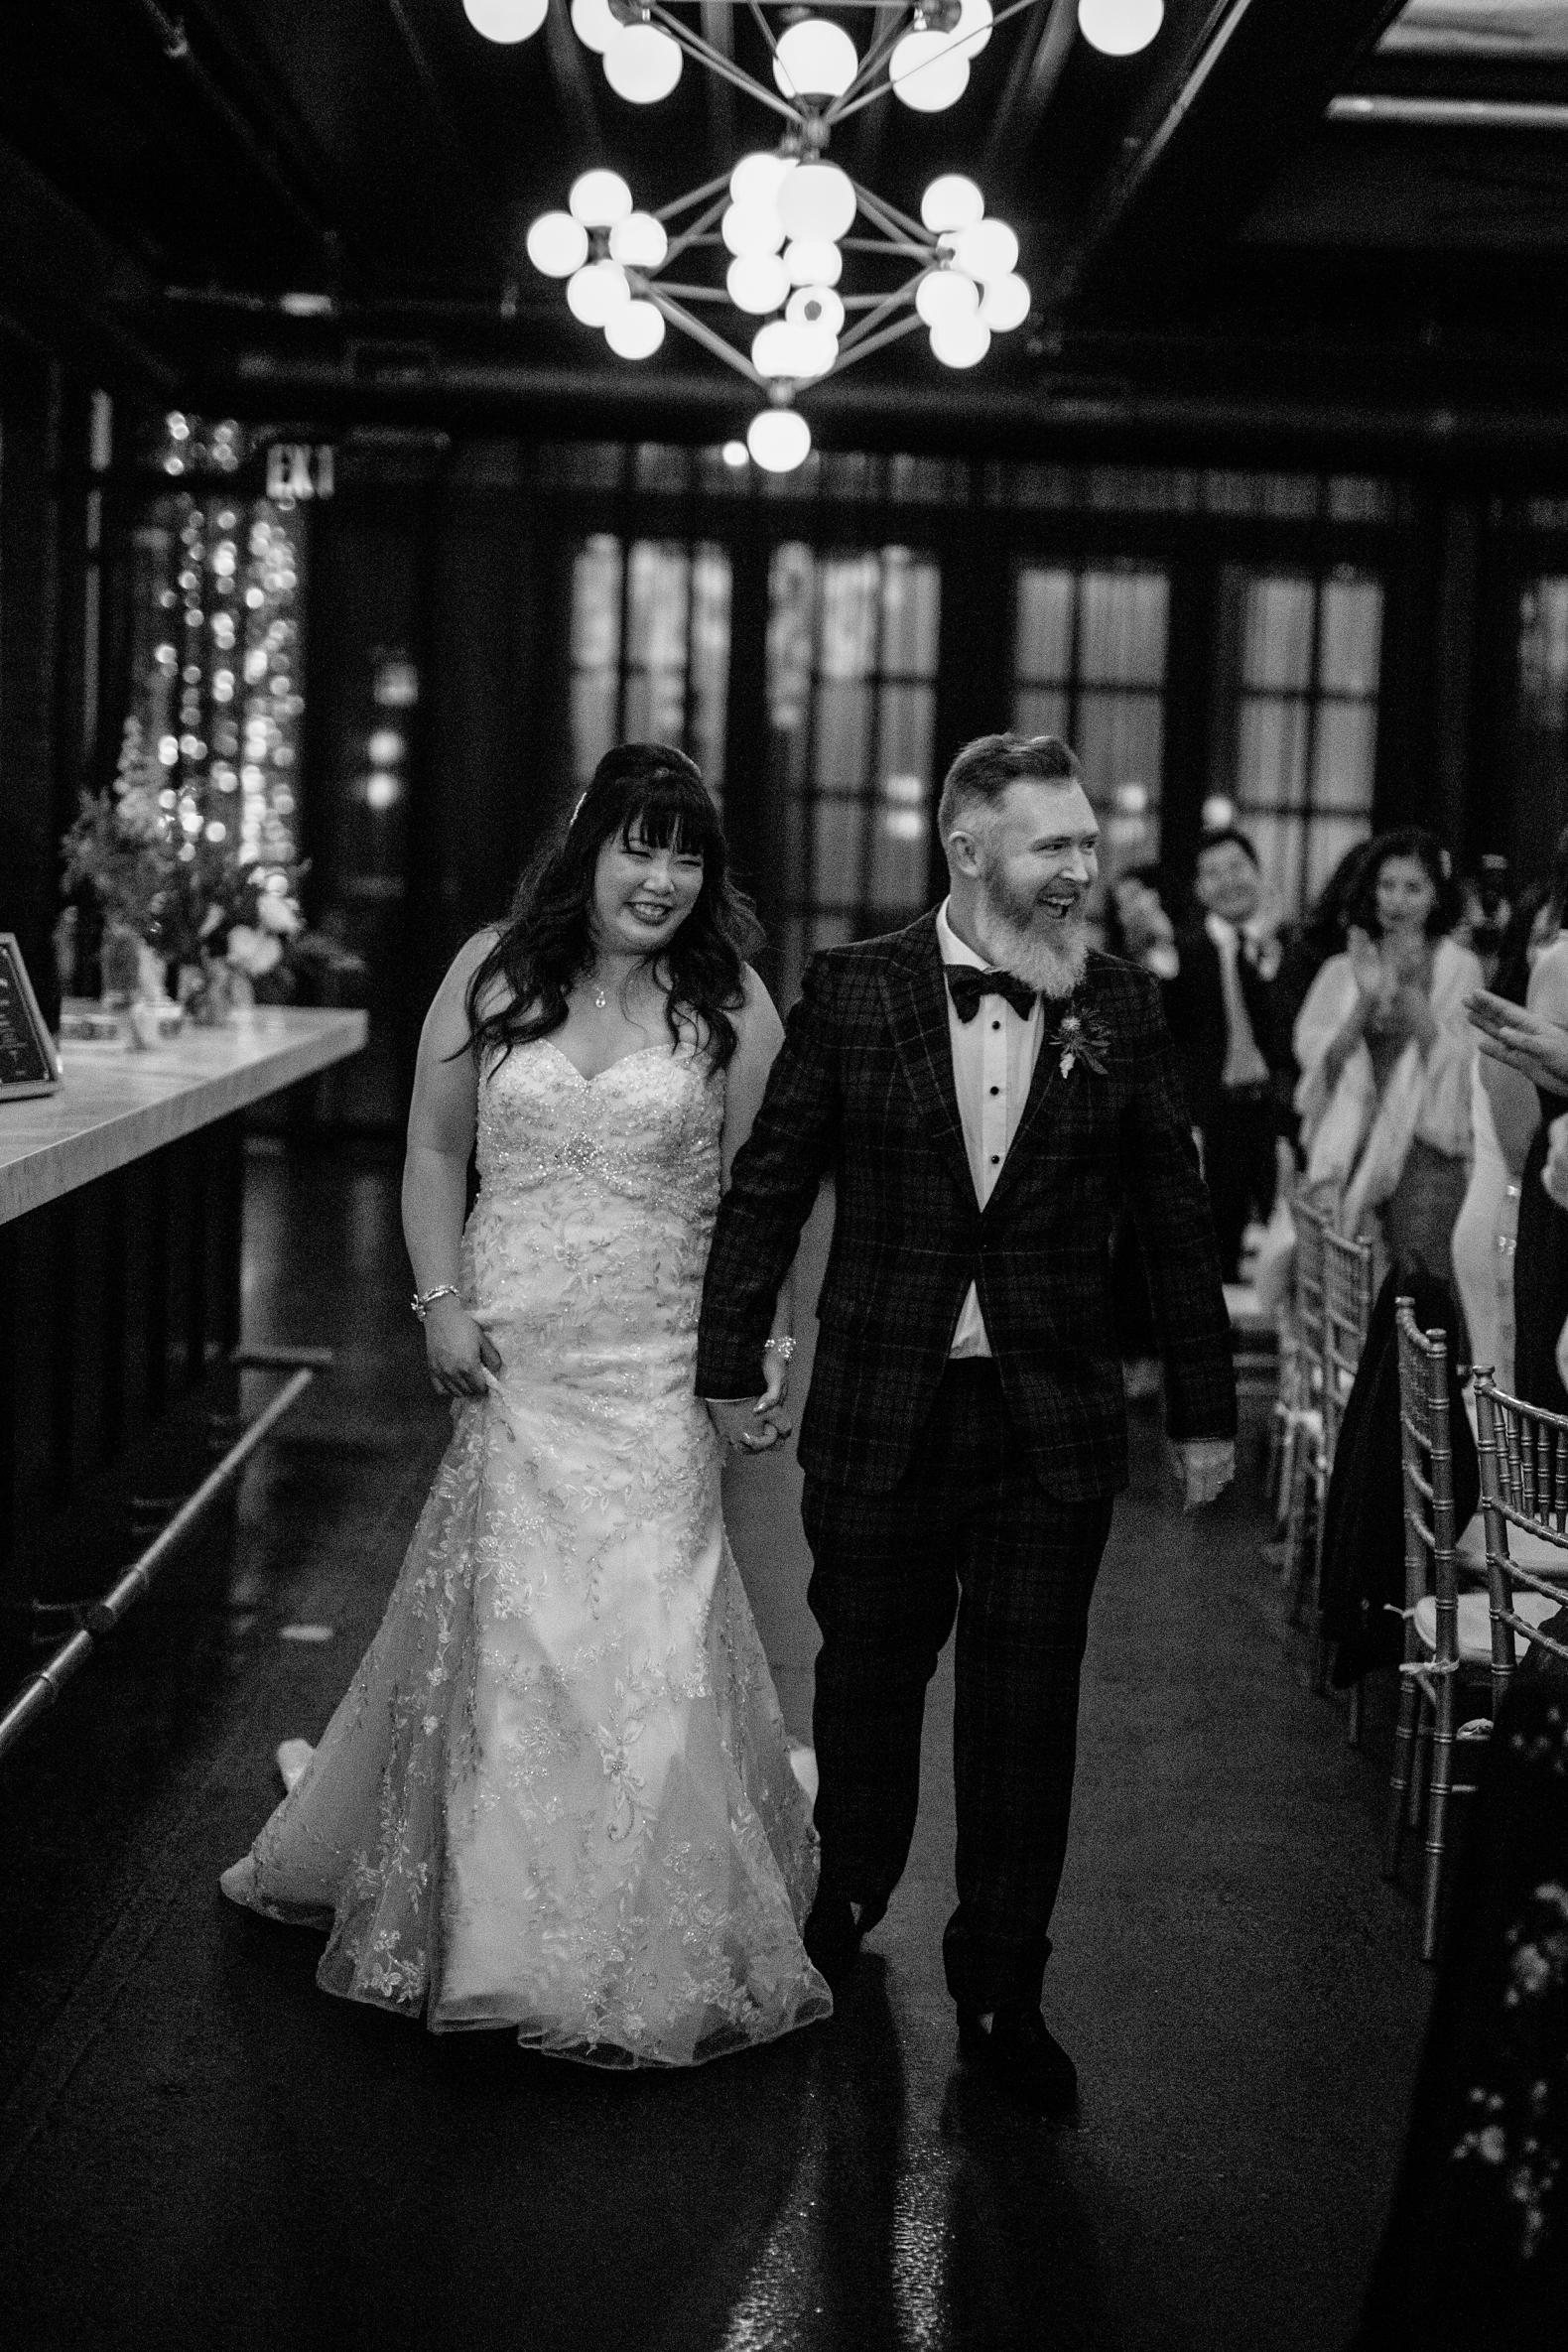 501-union-wedding-0102